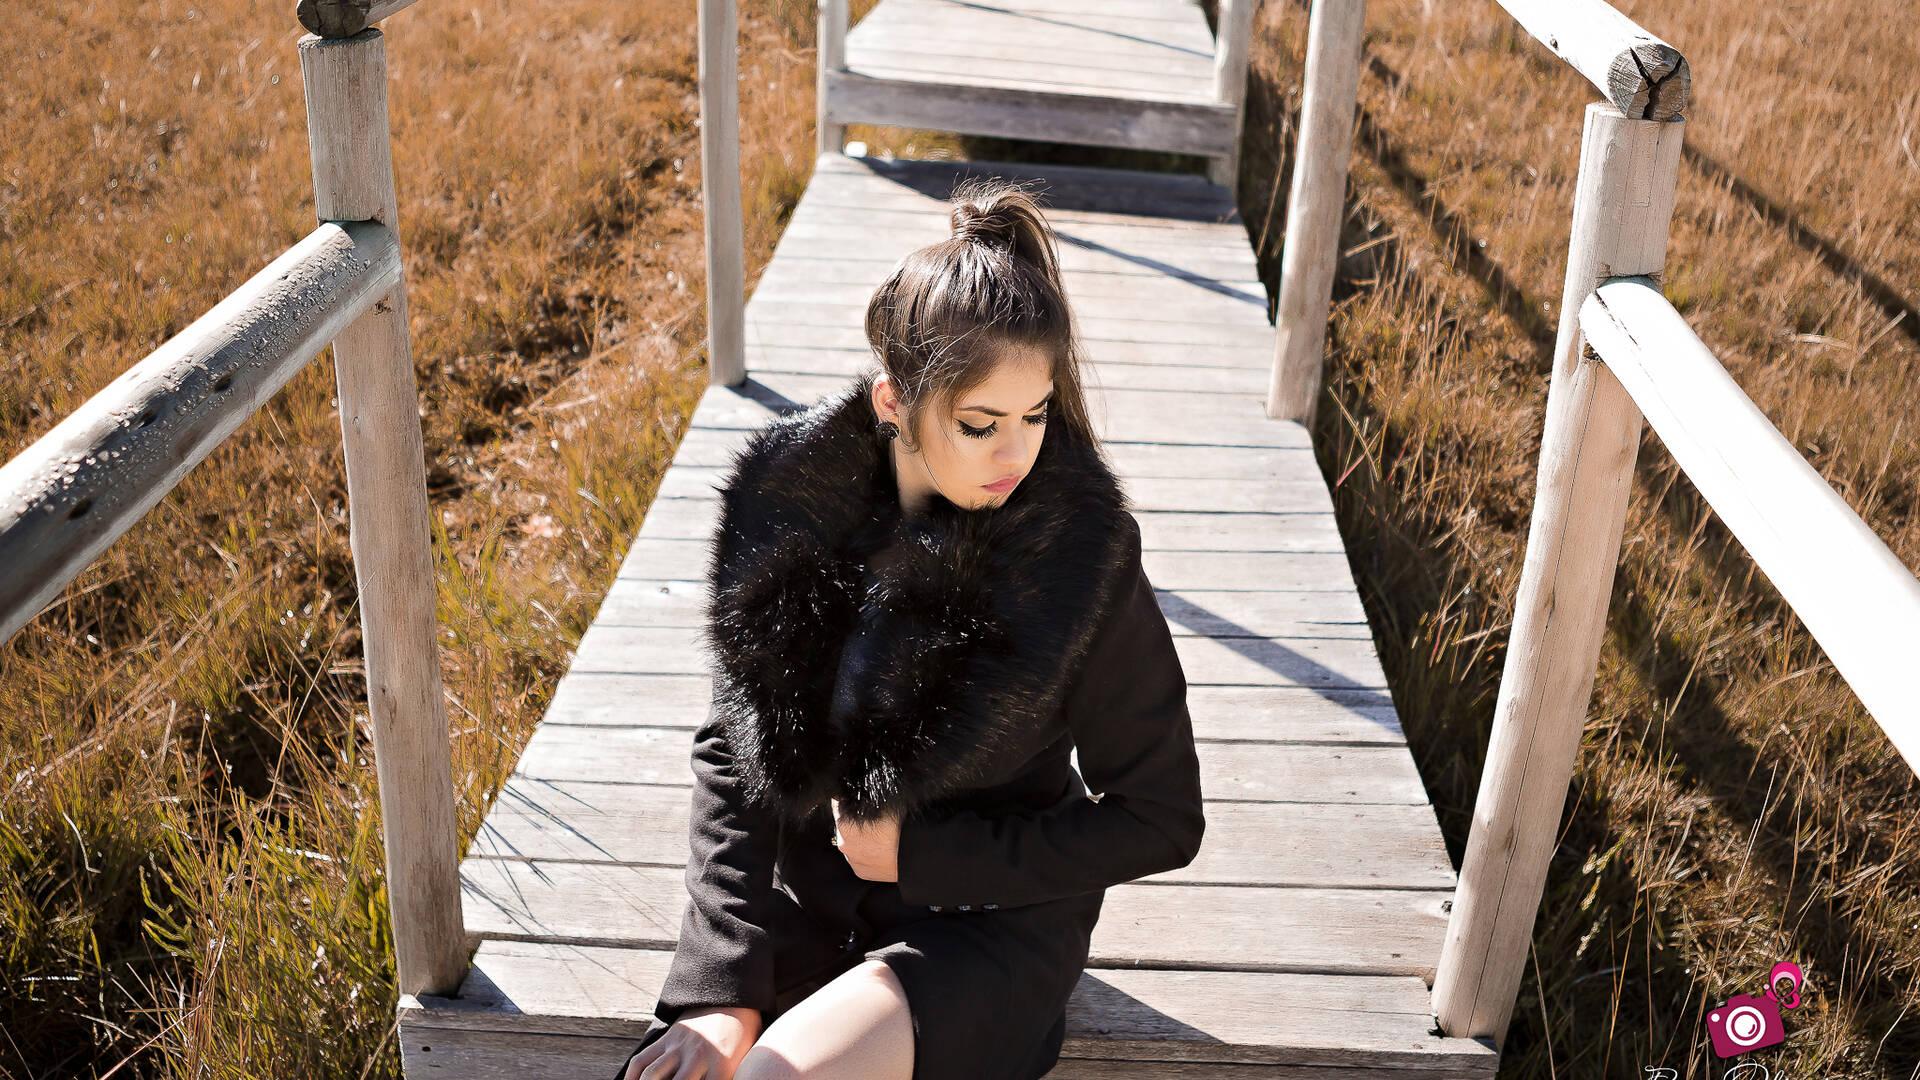 Ensaio Feminino de Nicoly